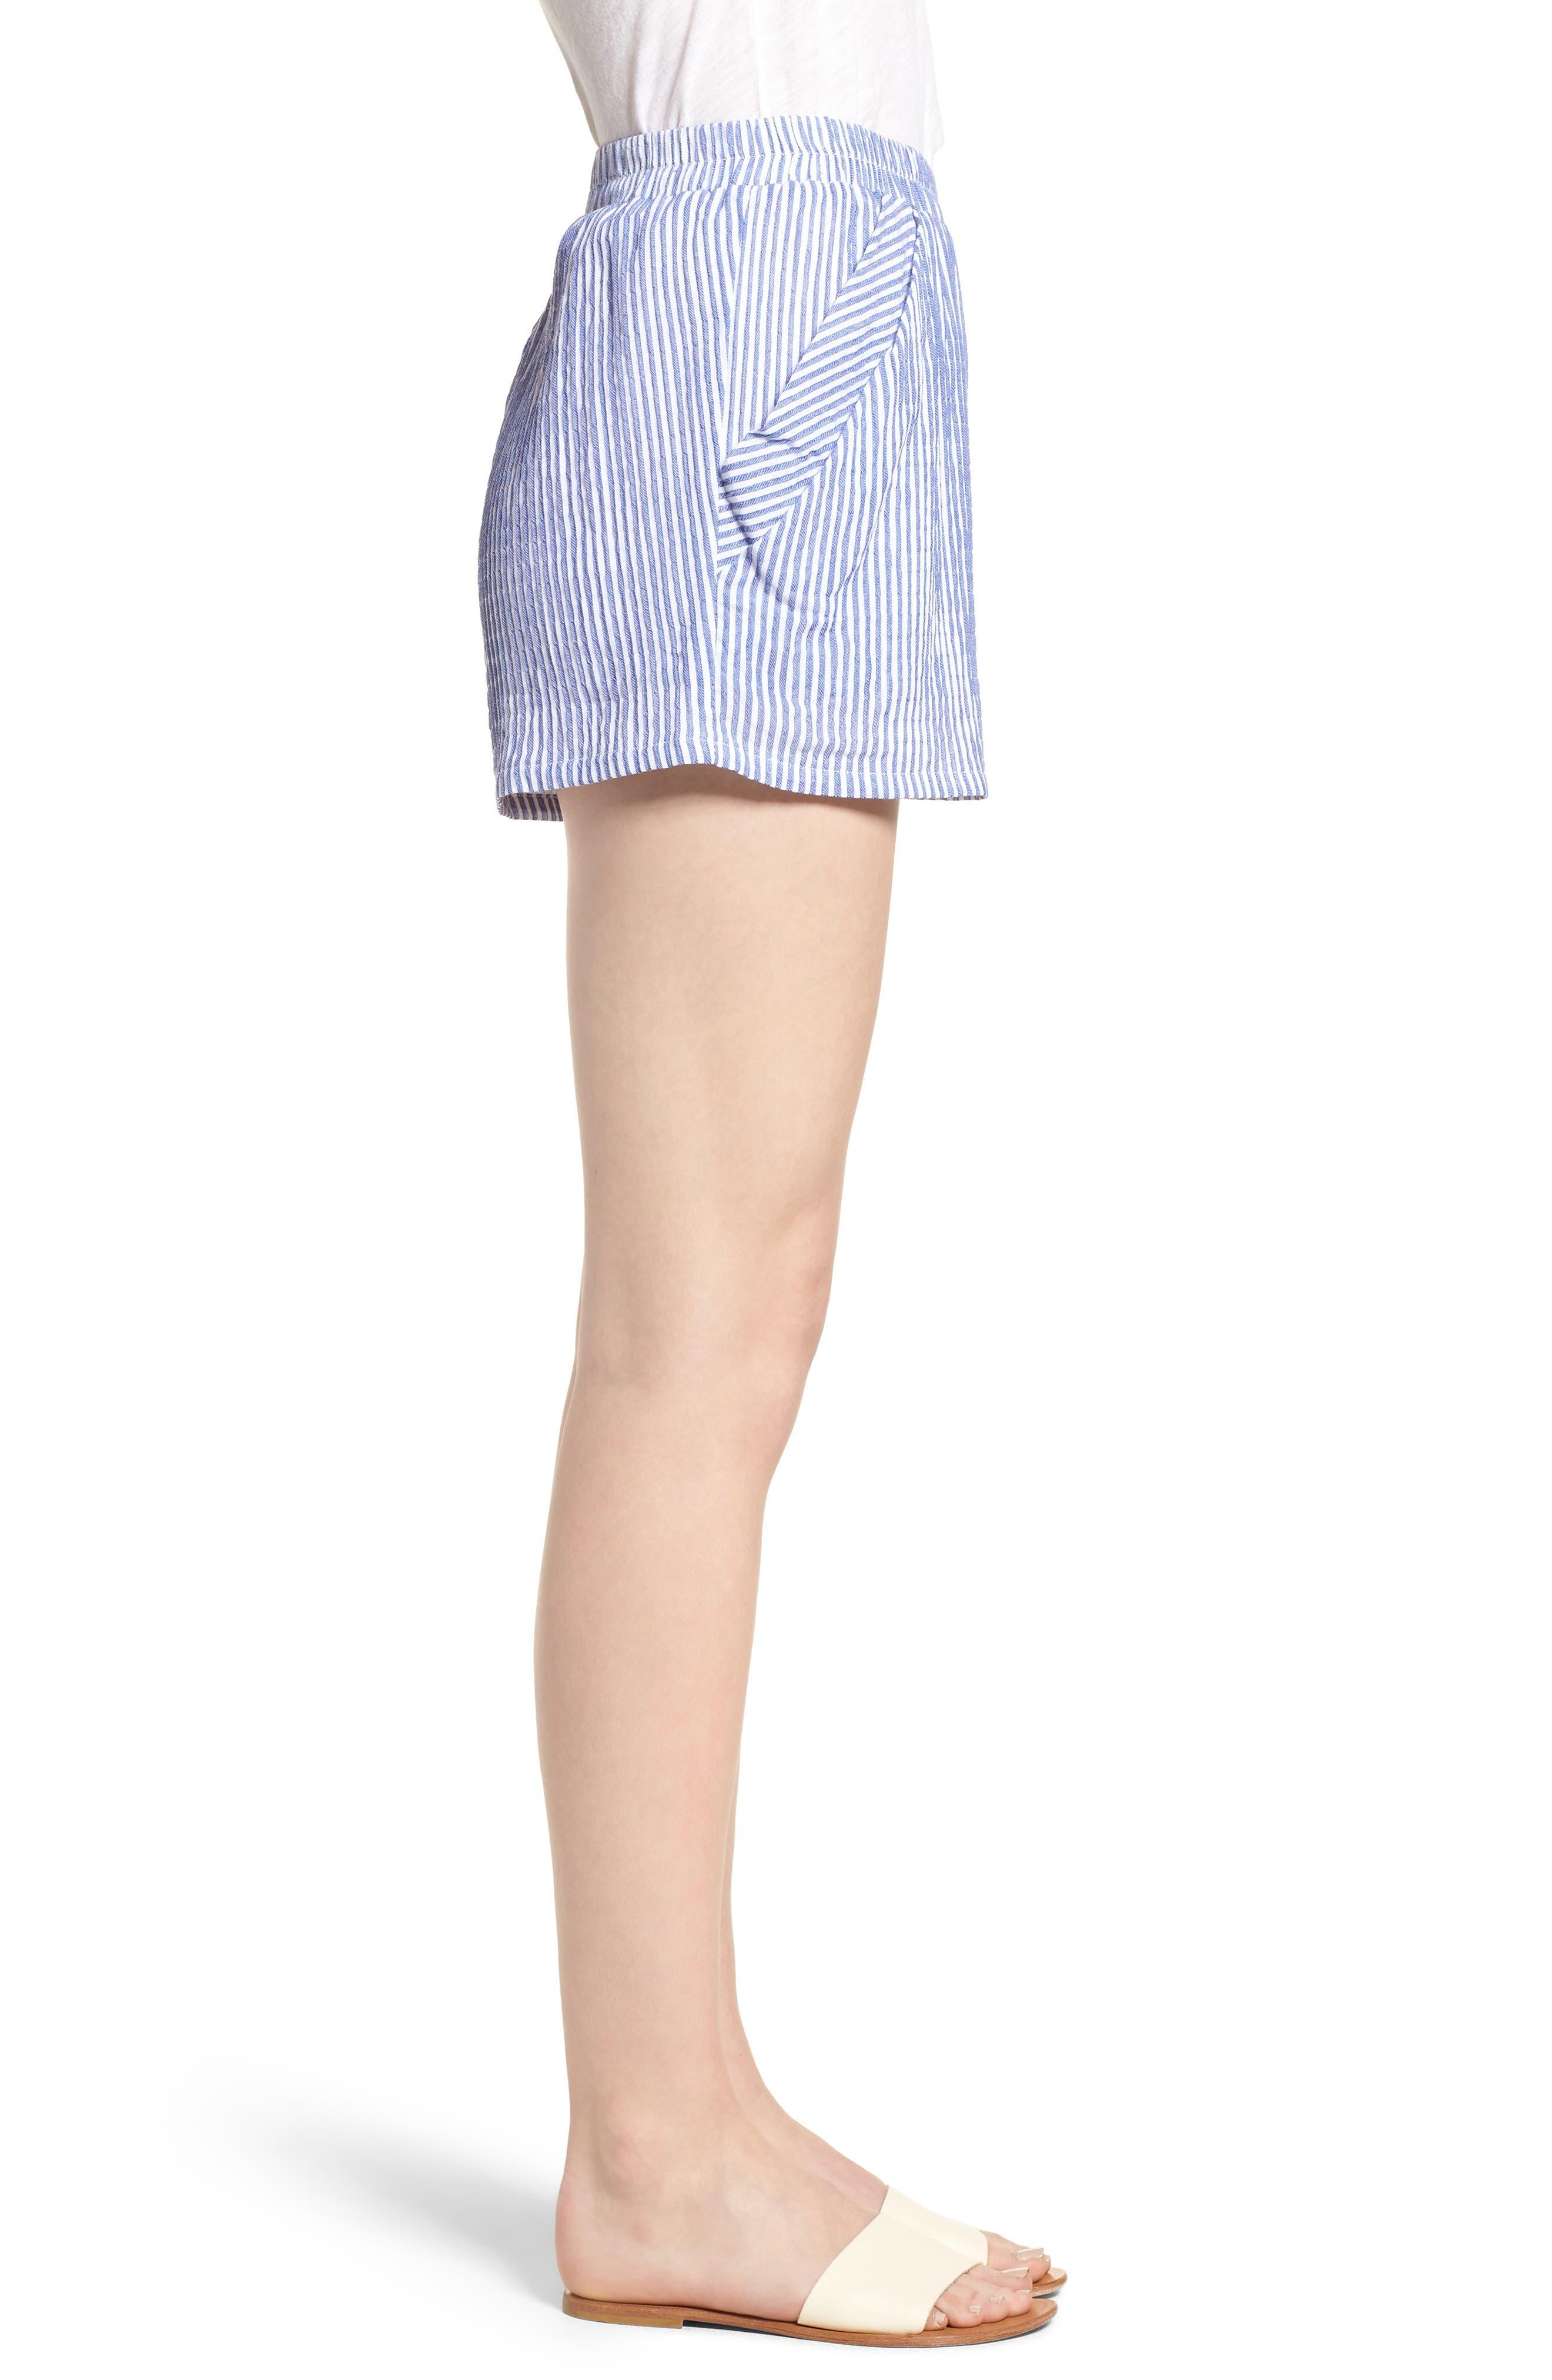 BISHOP + YOUNG,                             Stripe Shorts,                             Alternate thumbnail 3, color,                             400